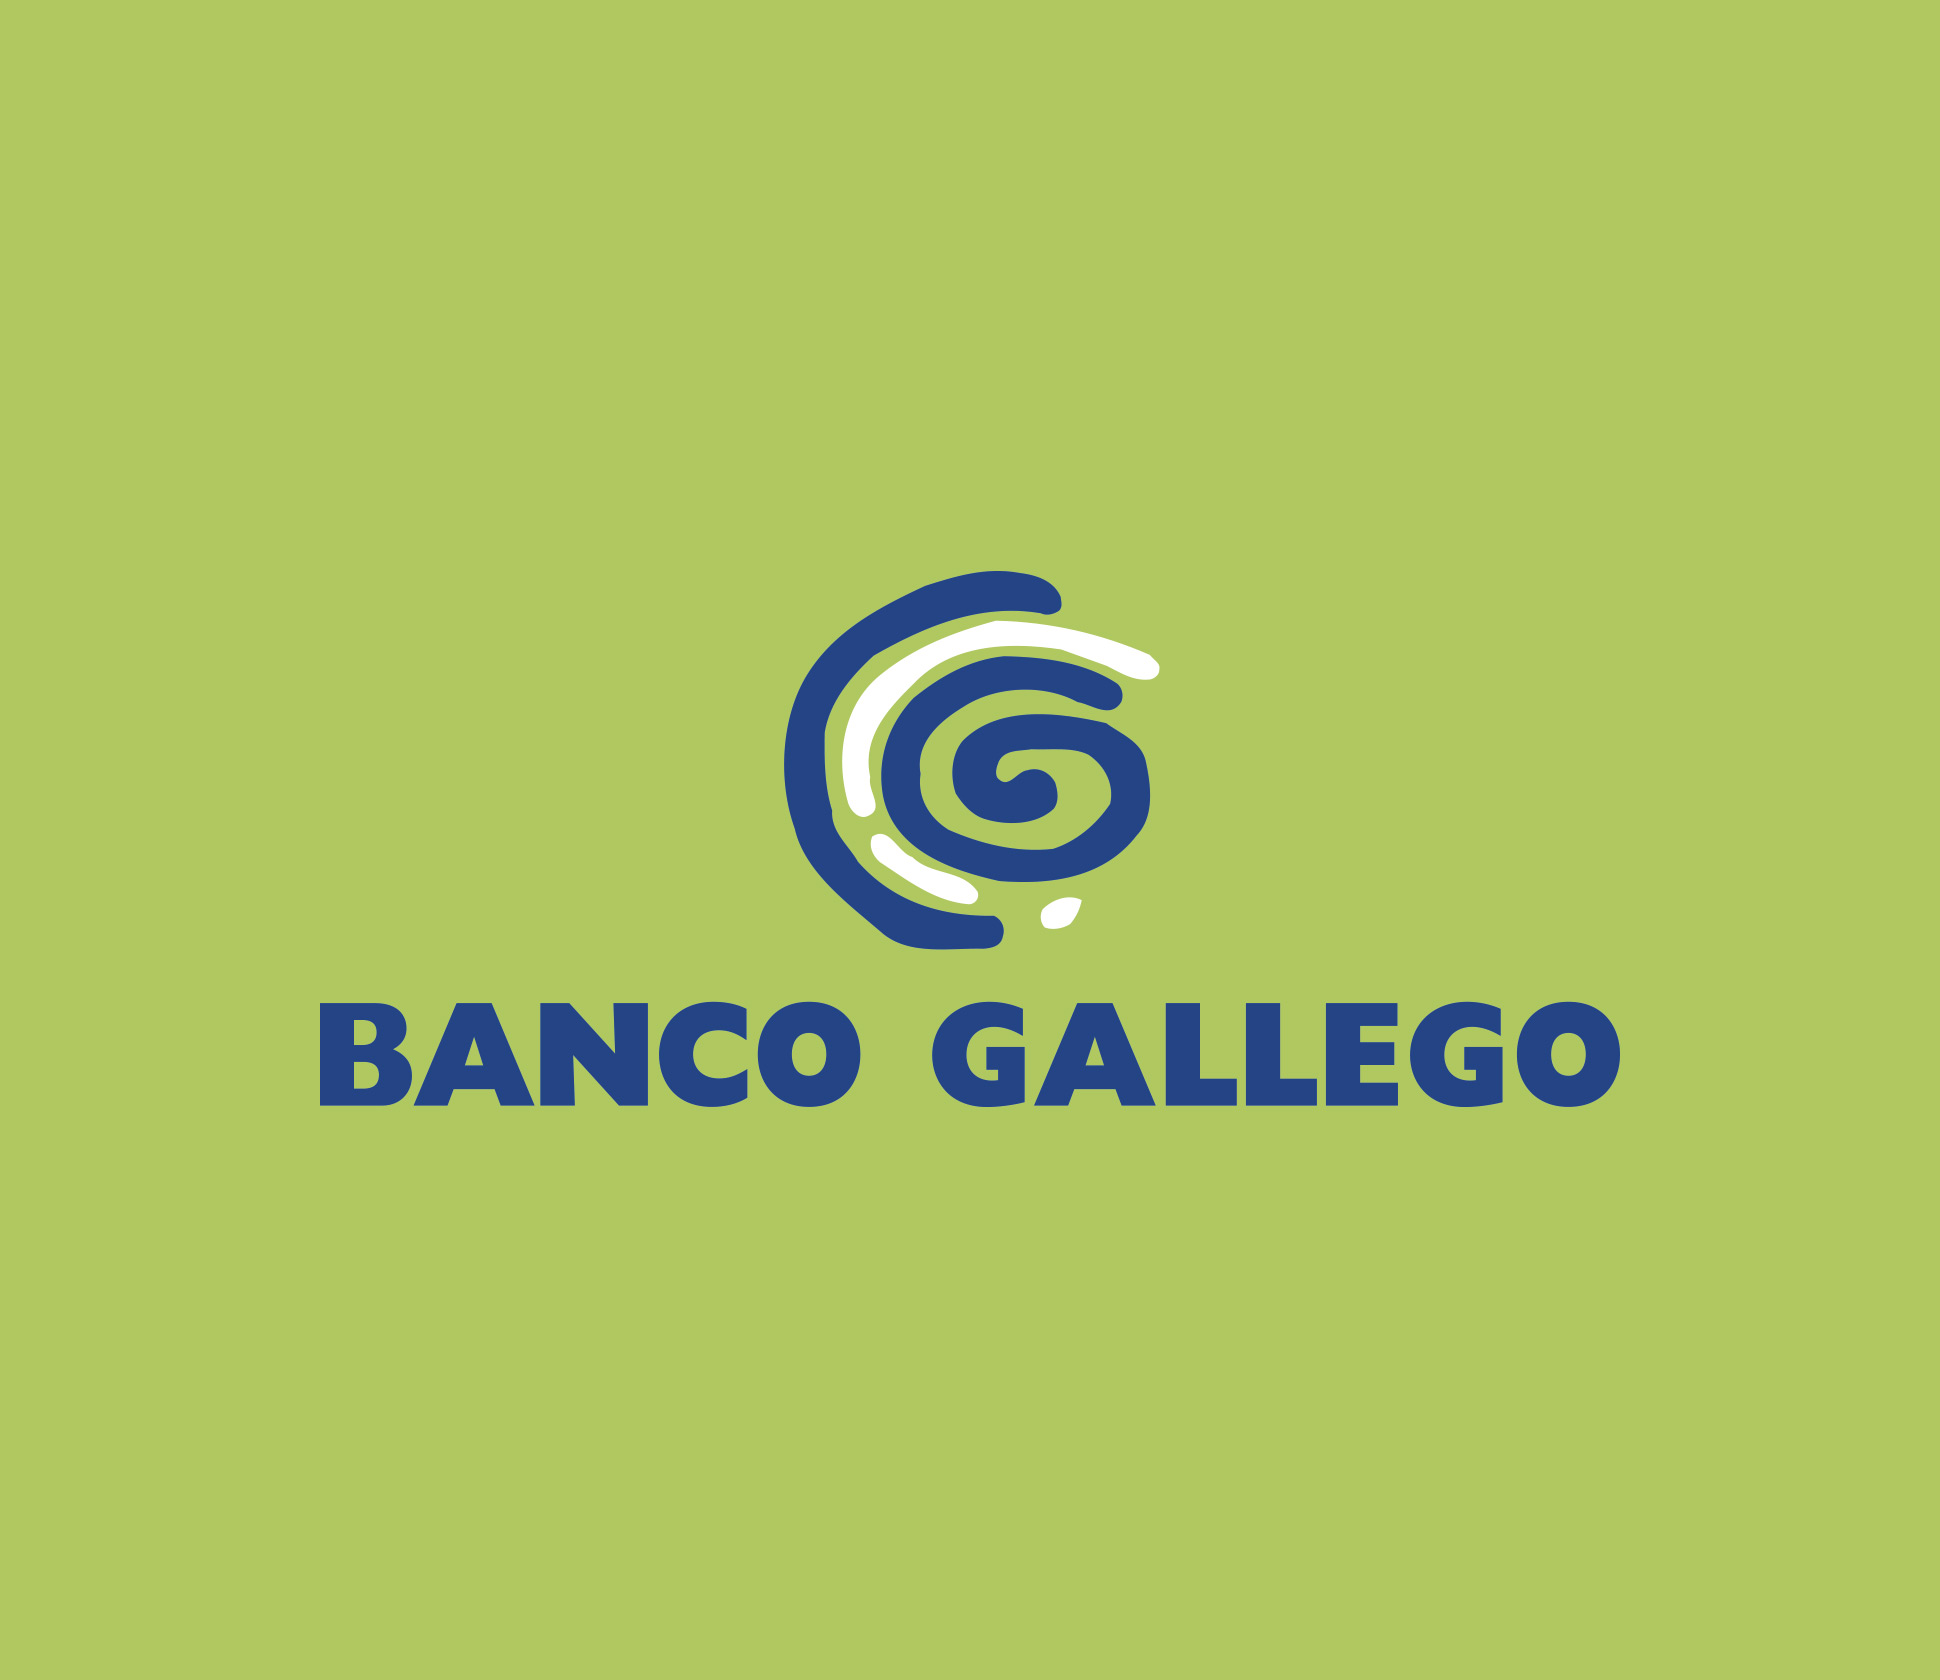 Sistema-Diseño-Banco-Gallego-Marca-logo-anterior